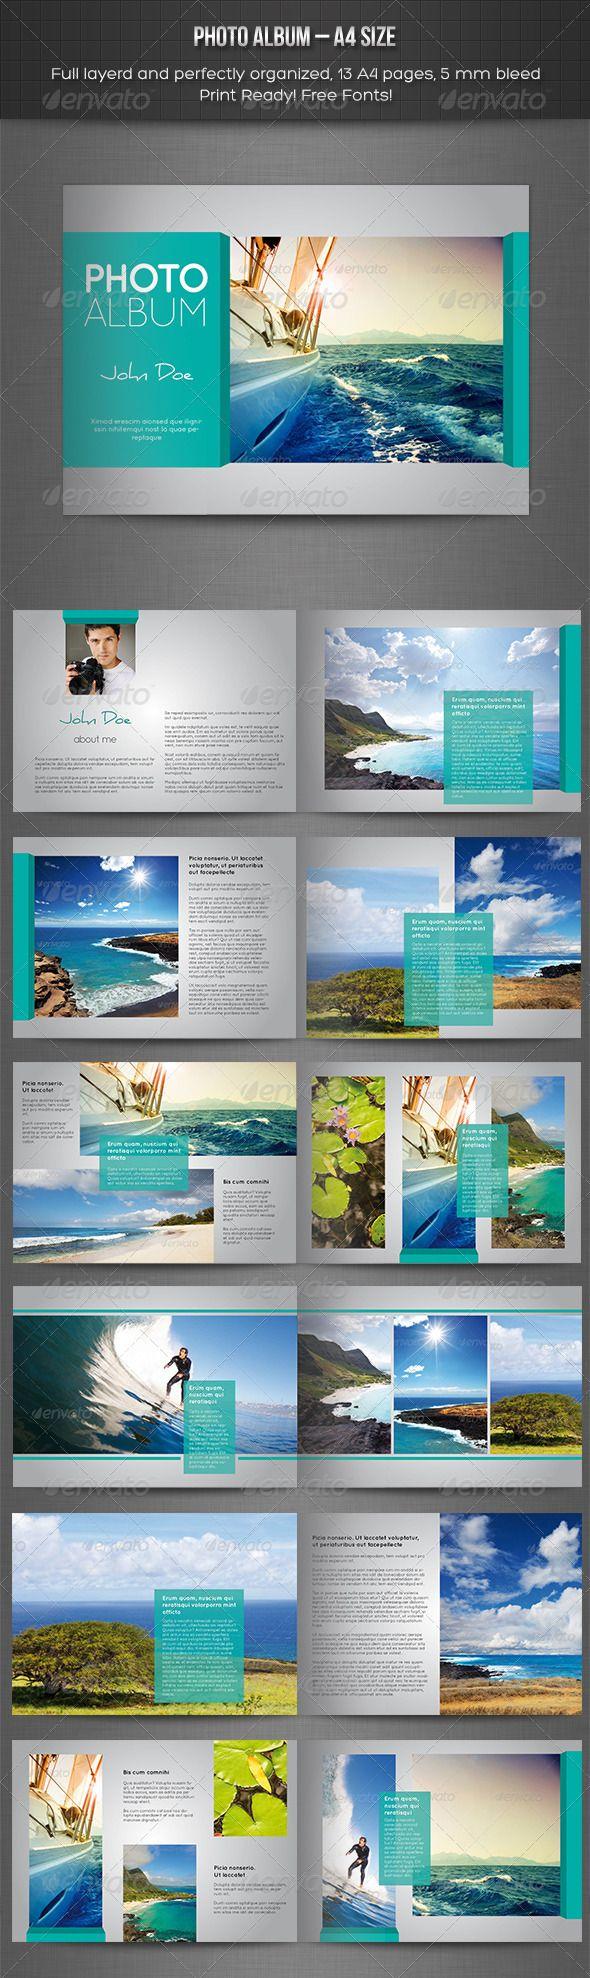 Landscape Photo Book Layout Templates